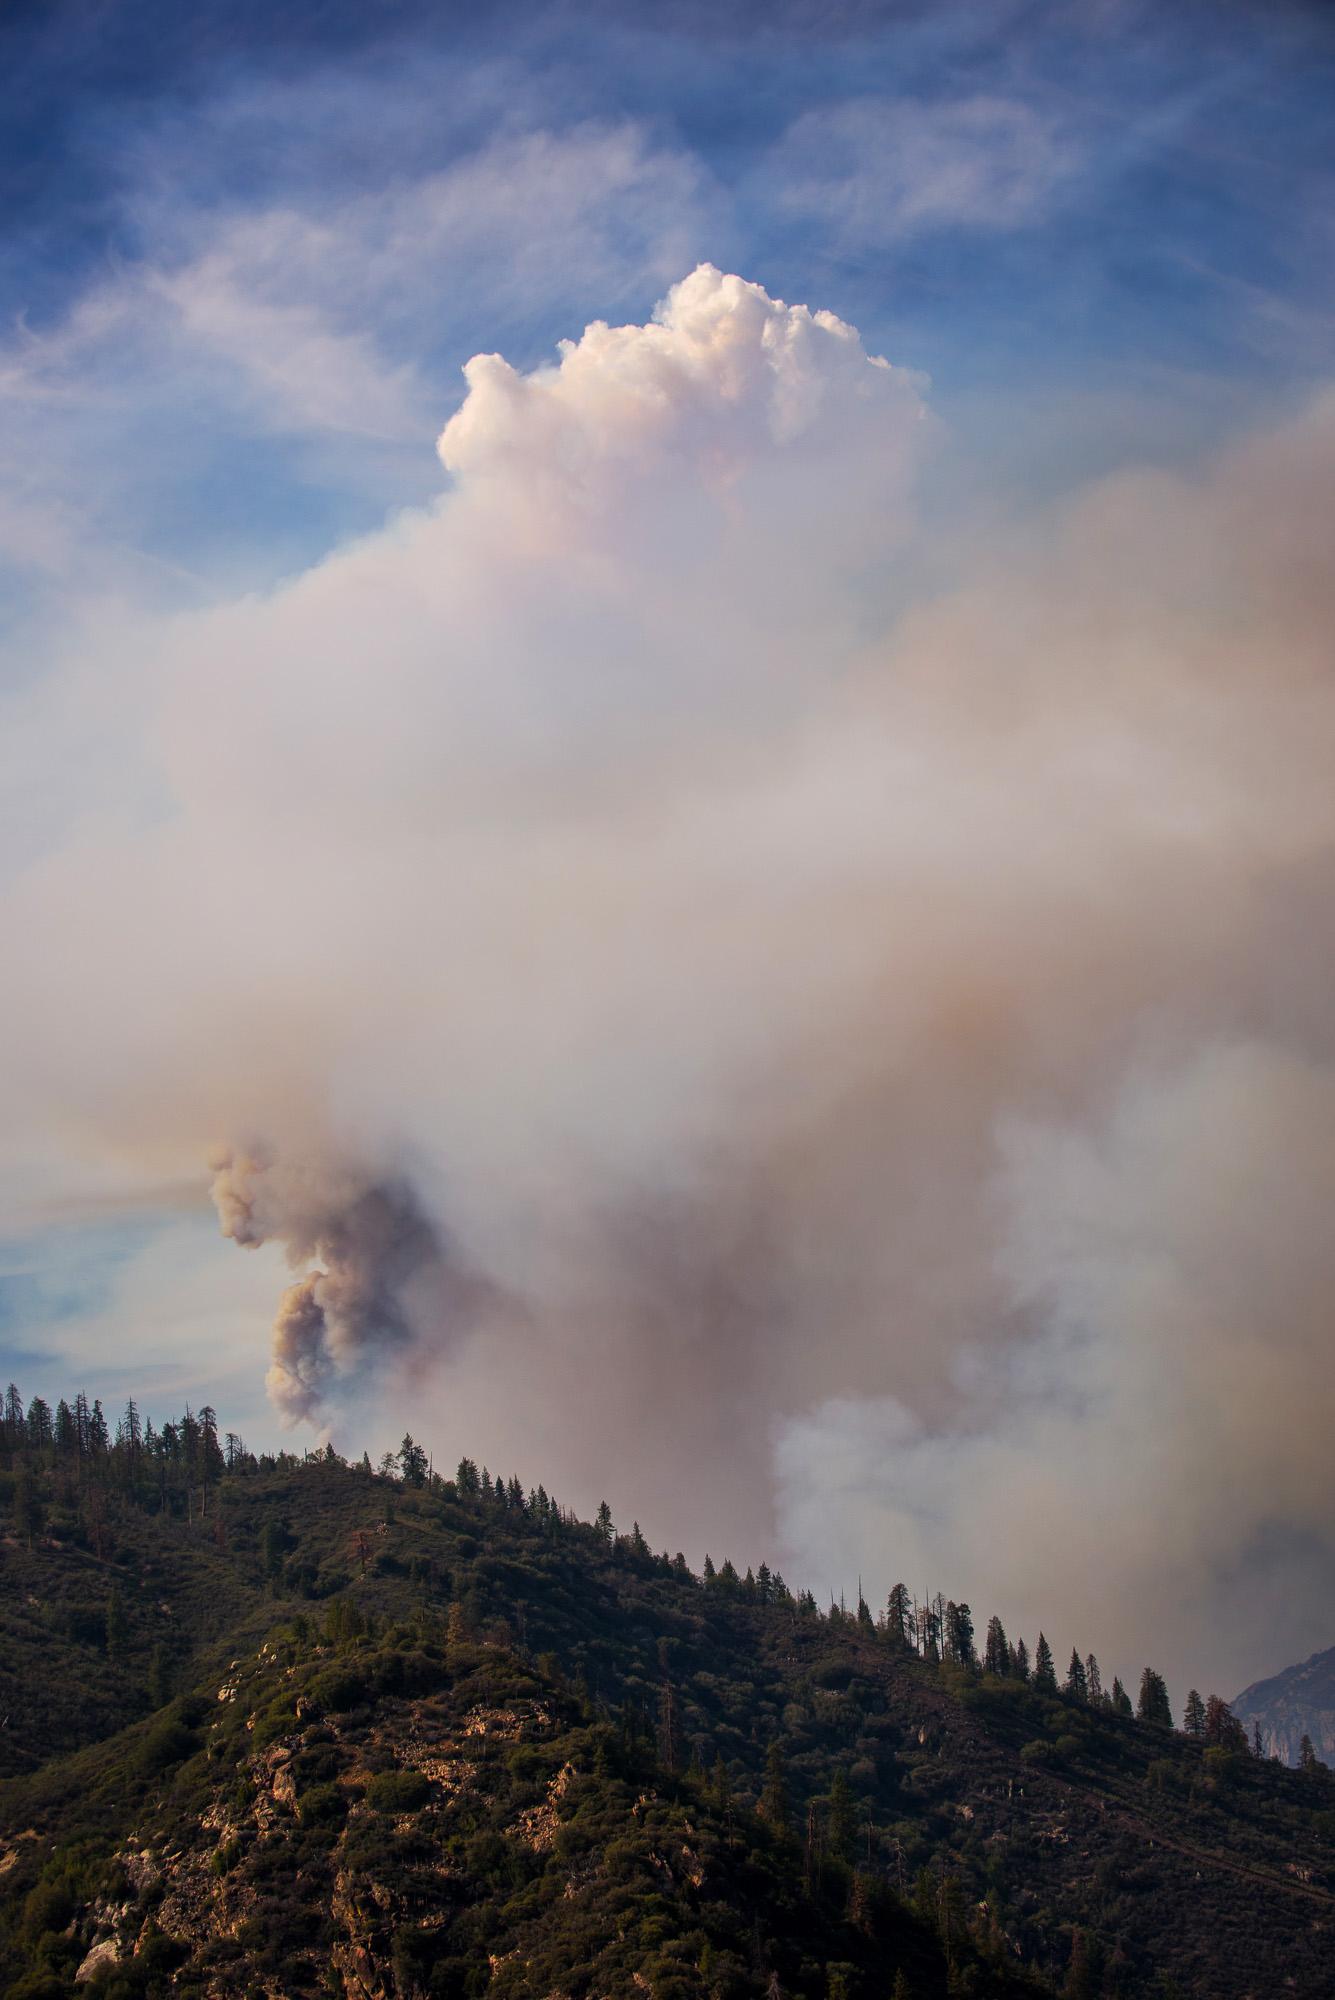 rough_fire_hume_lake_smoke_brittany_app.jpg